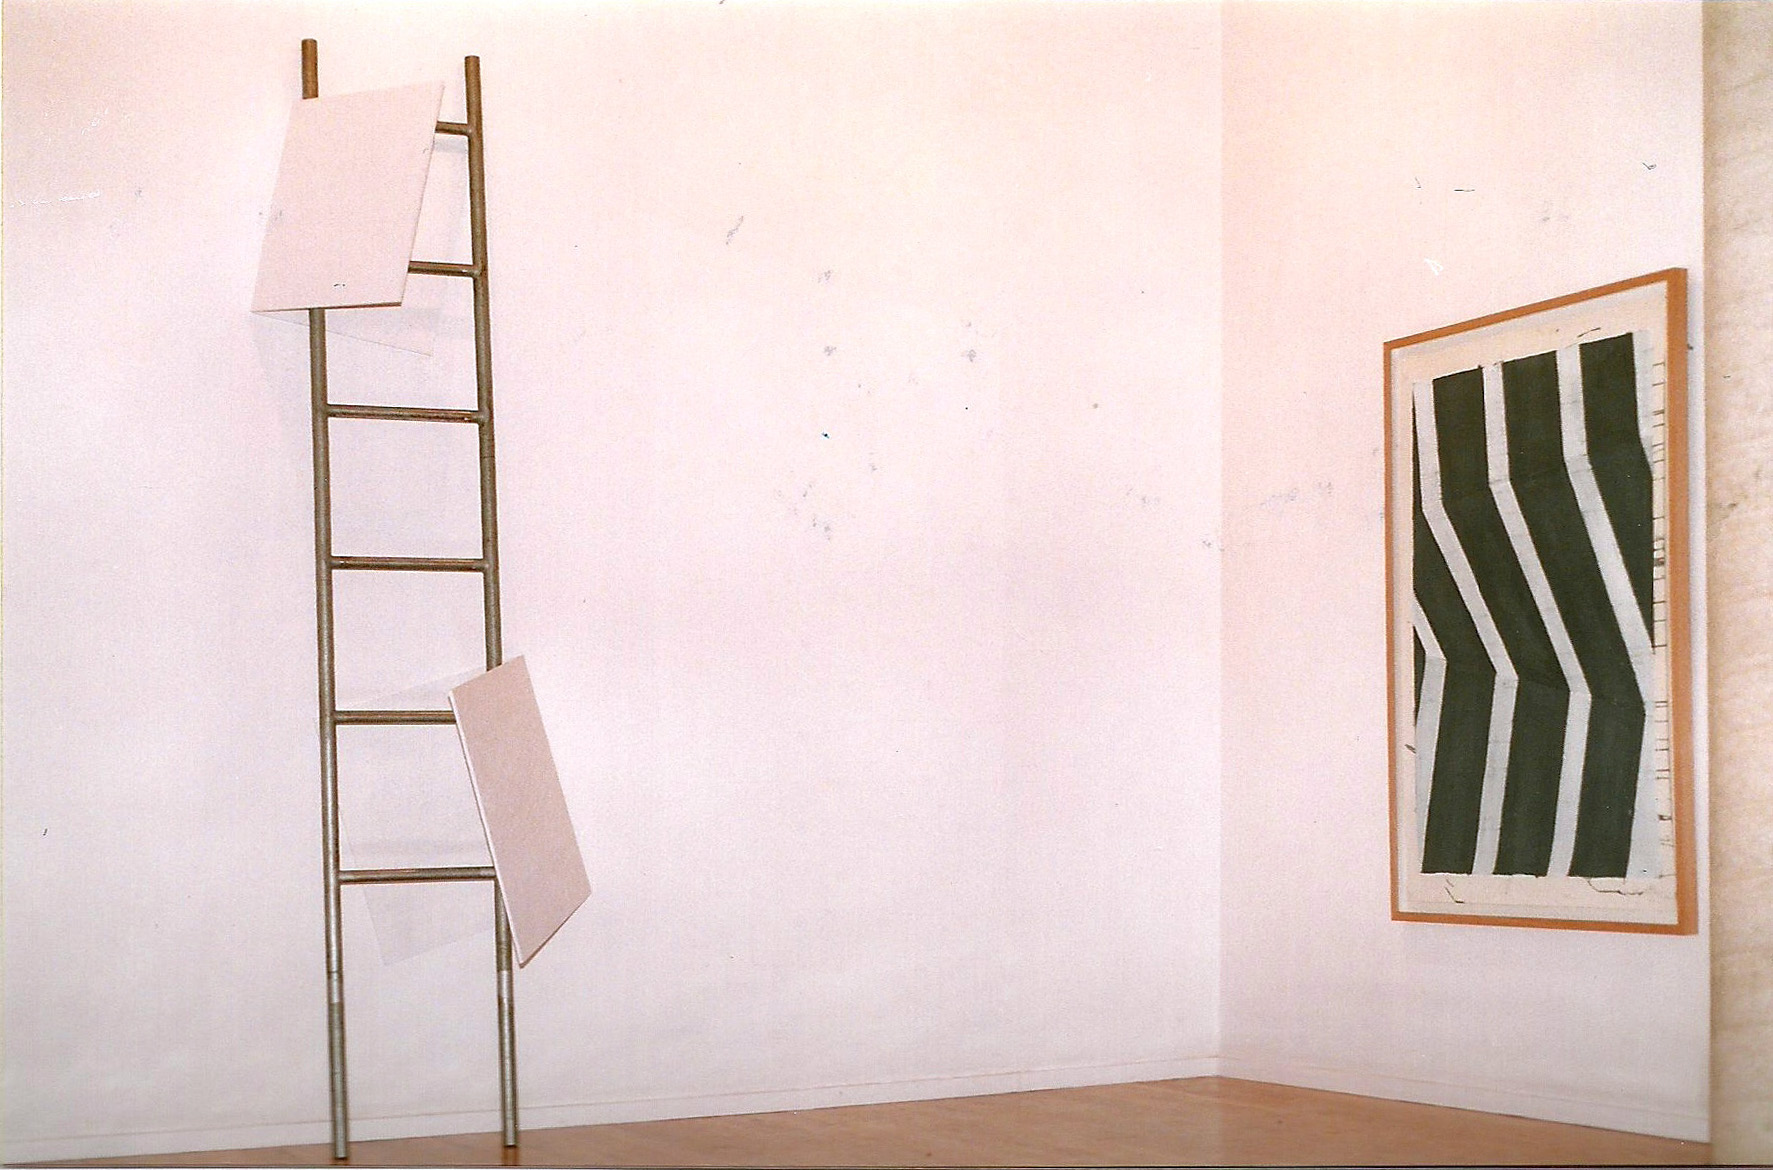 Exhibition view in the Galeria Maior of Pollença, 1997